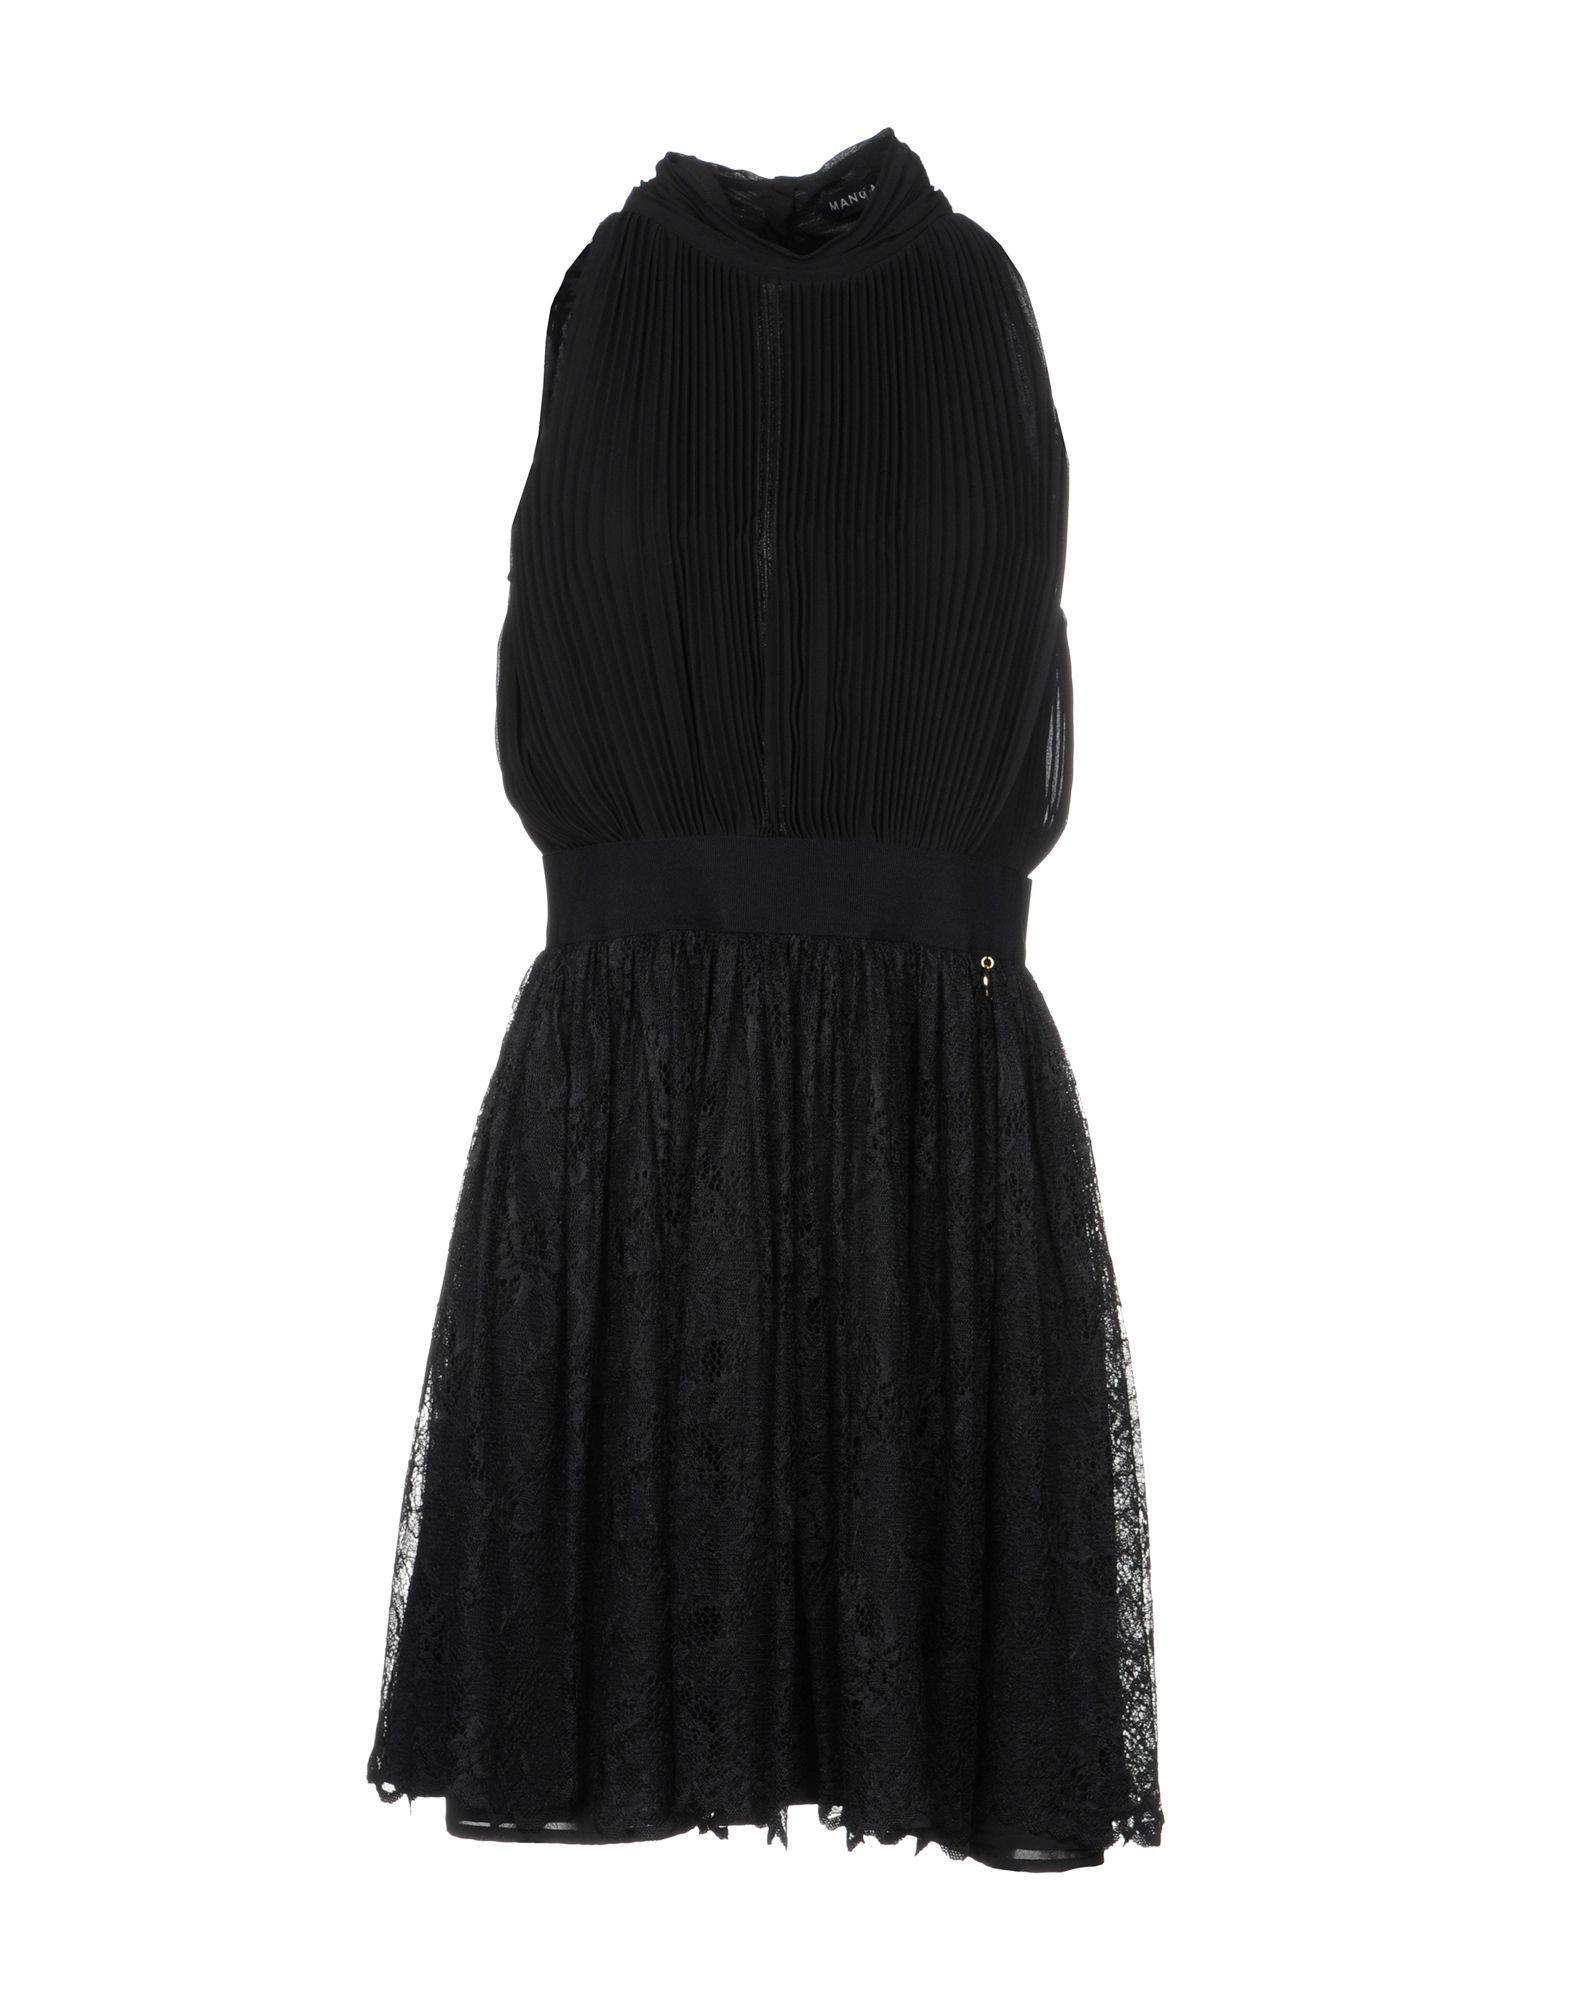 Mangano Short Dress In Black